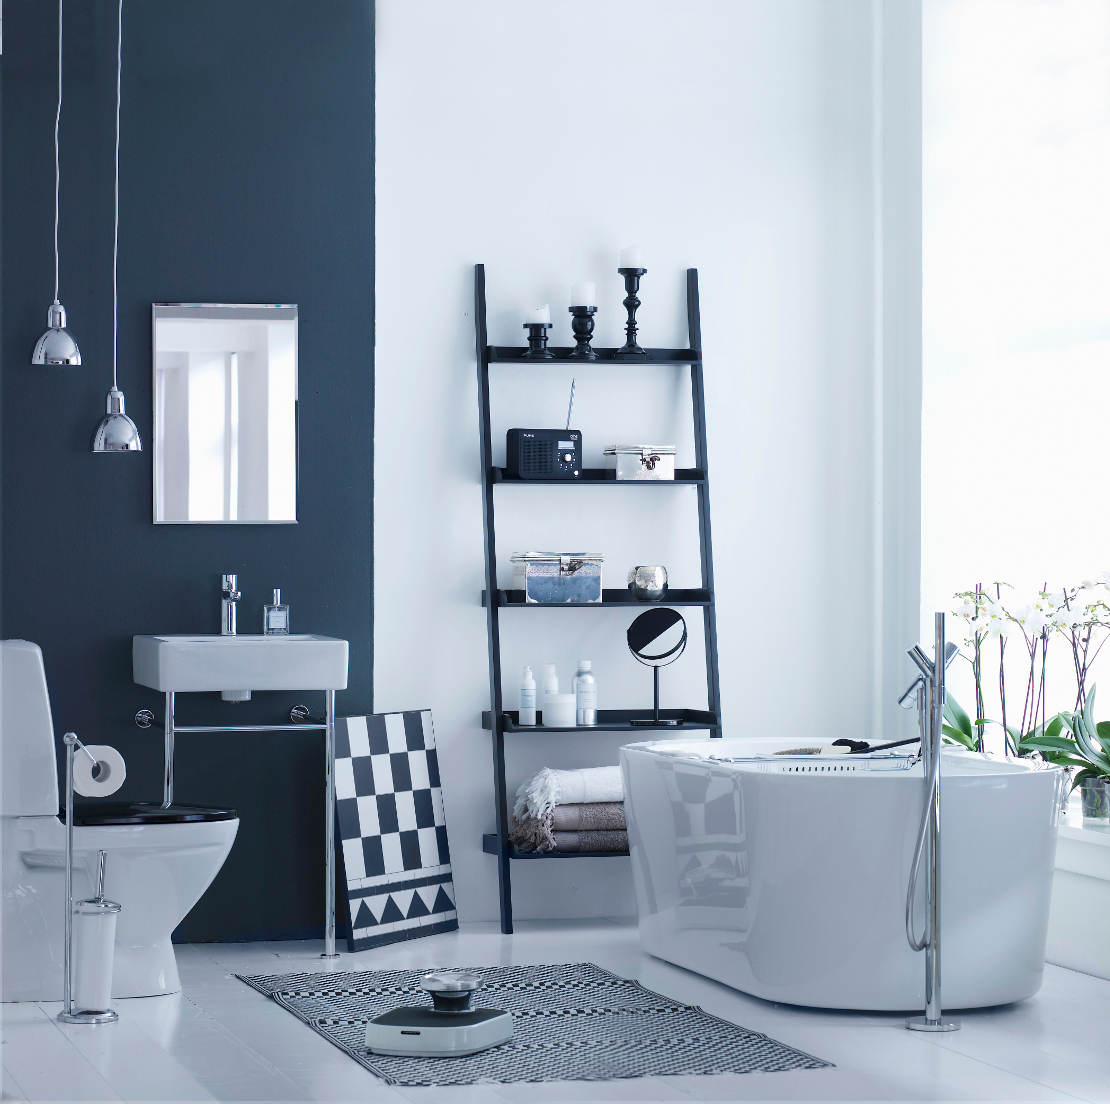 idee per il bagno come cambiare look westwing magazine. Black Bedroom Furniture Sets. Home Design Ideas